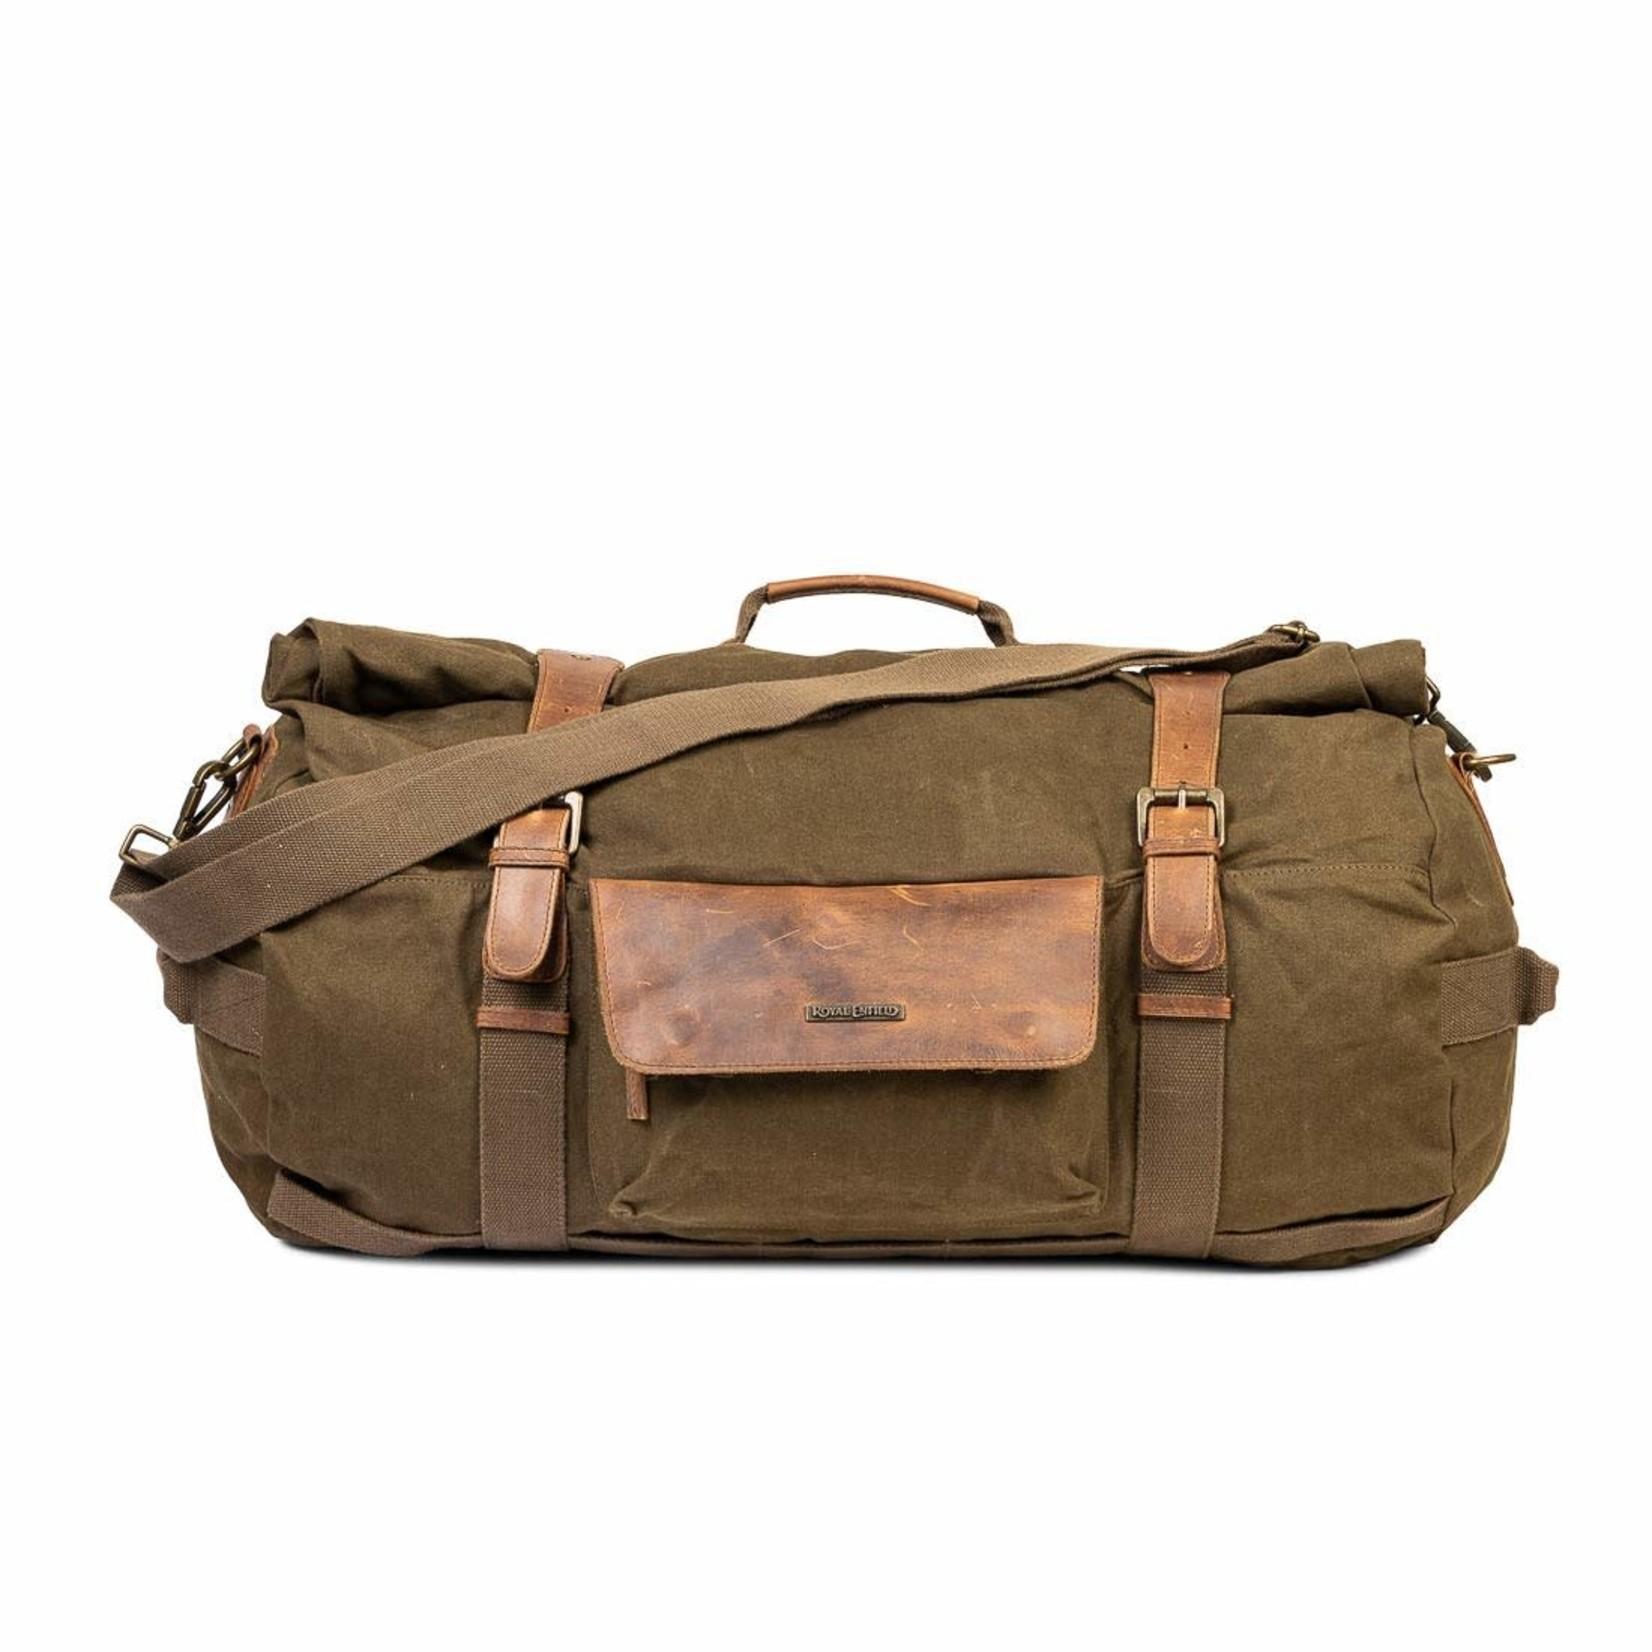 Royal Enfield Royal Enfield Duffel Bag